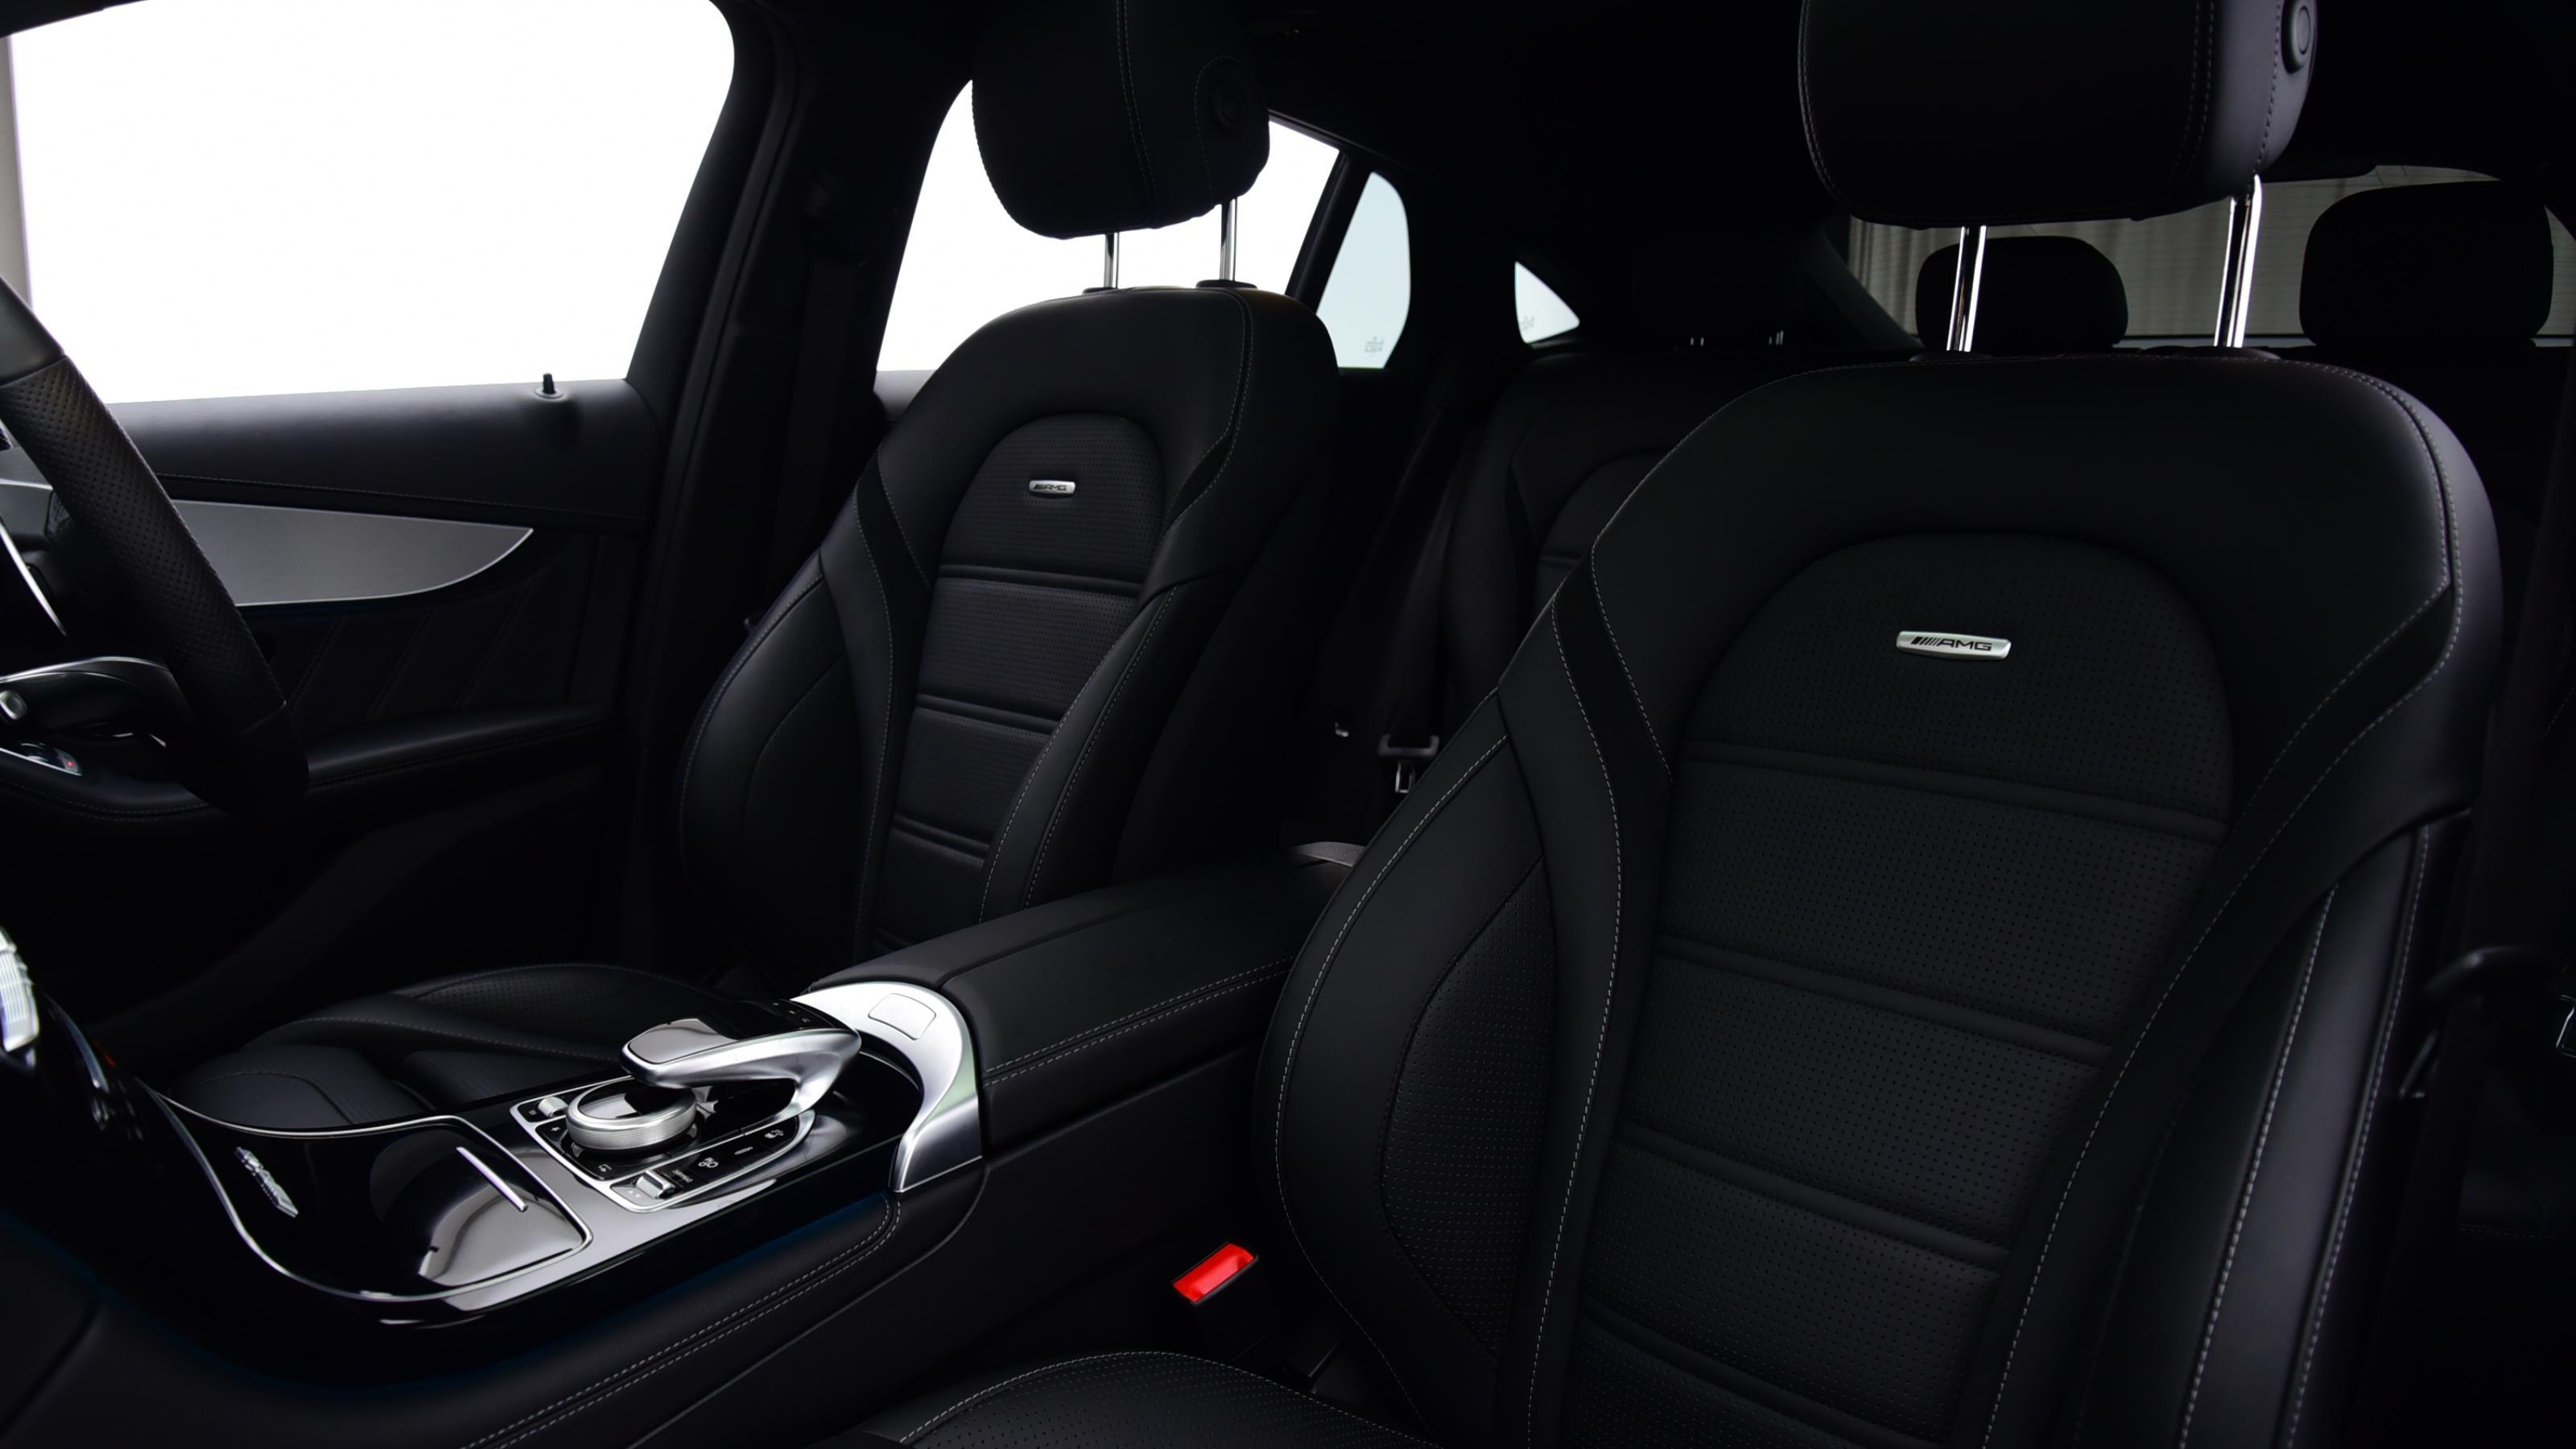 Used 2018 Mercedes-Benz GLC AMG 63 Premium 4matic WHITE at Saxton4x4